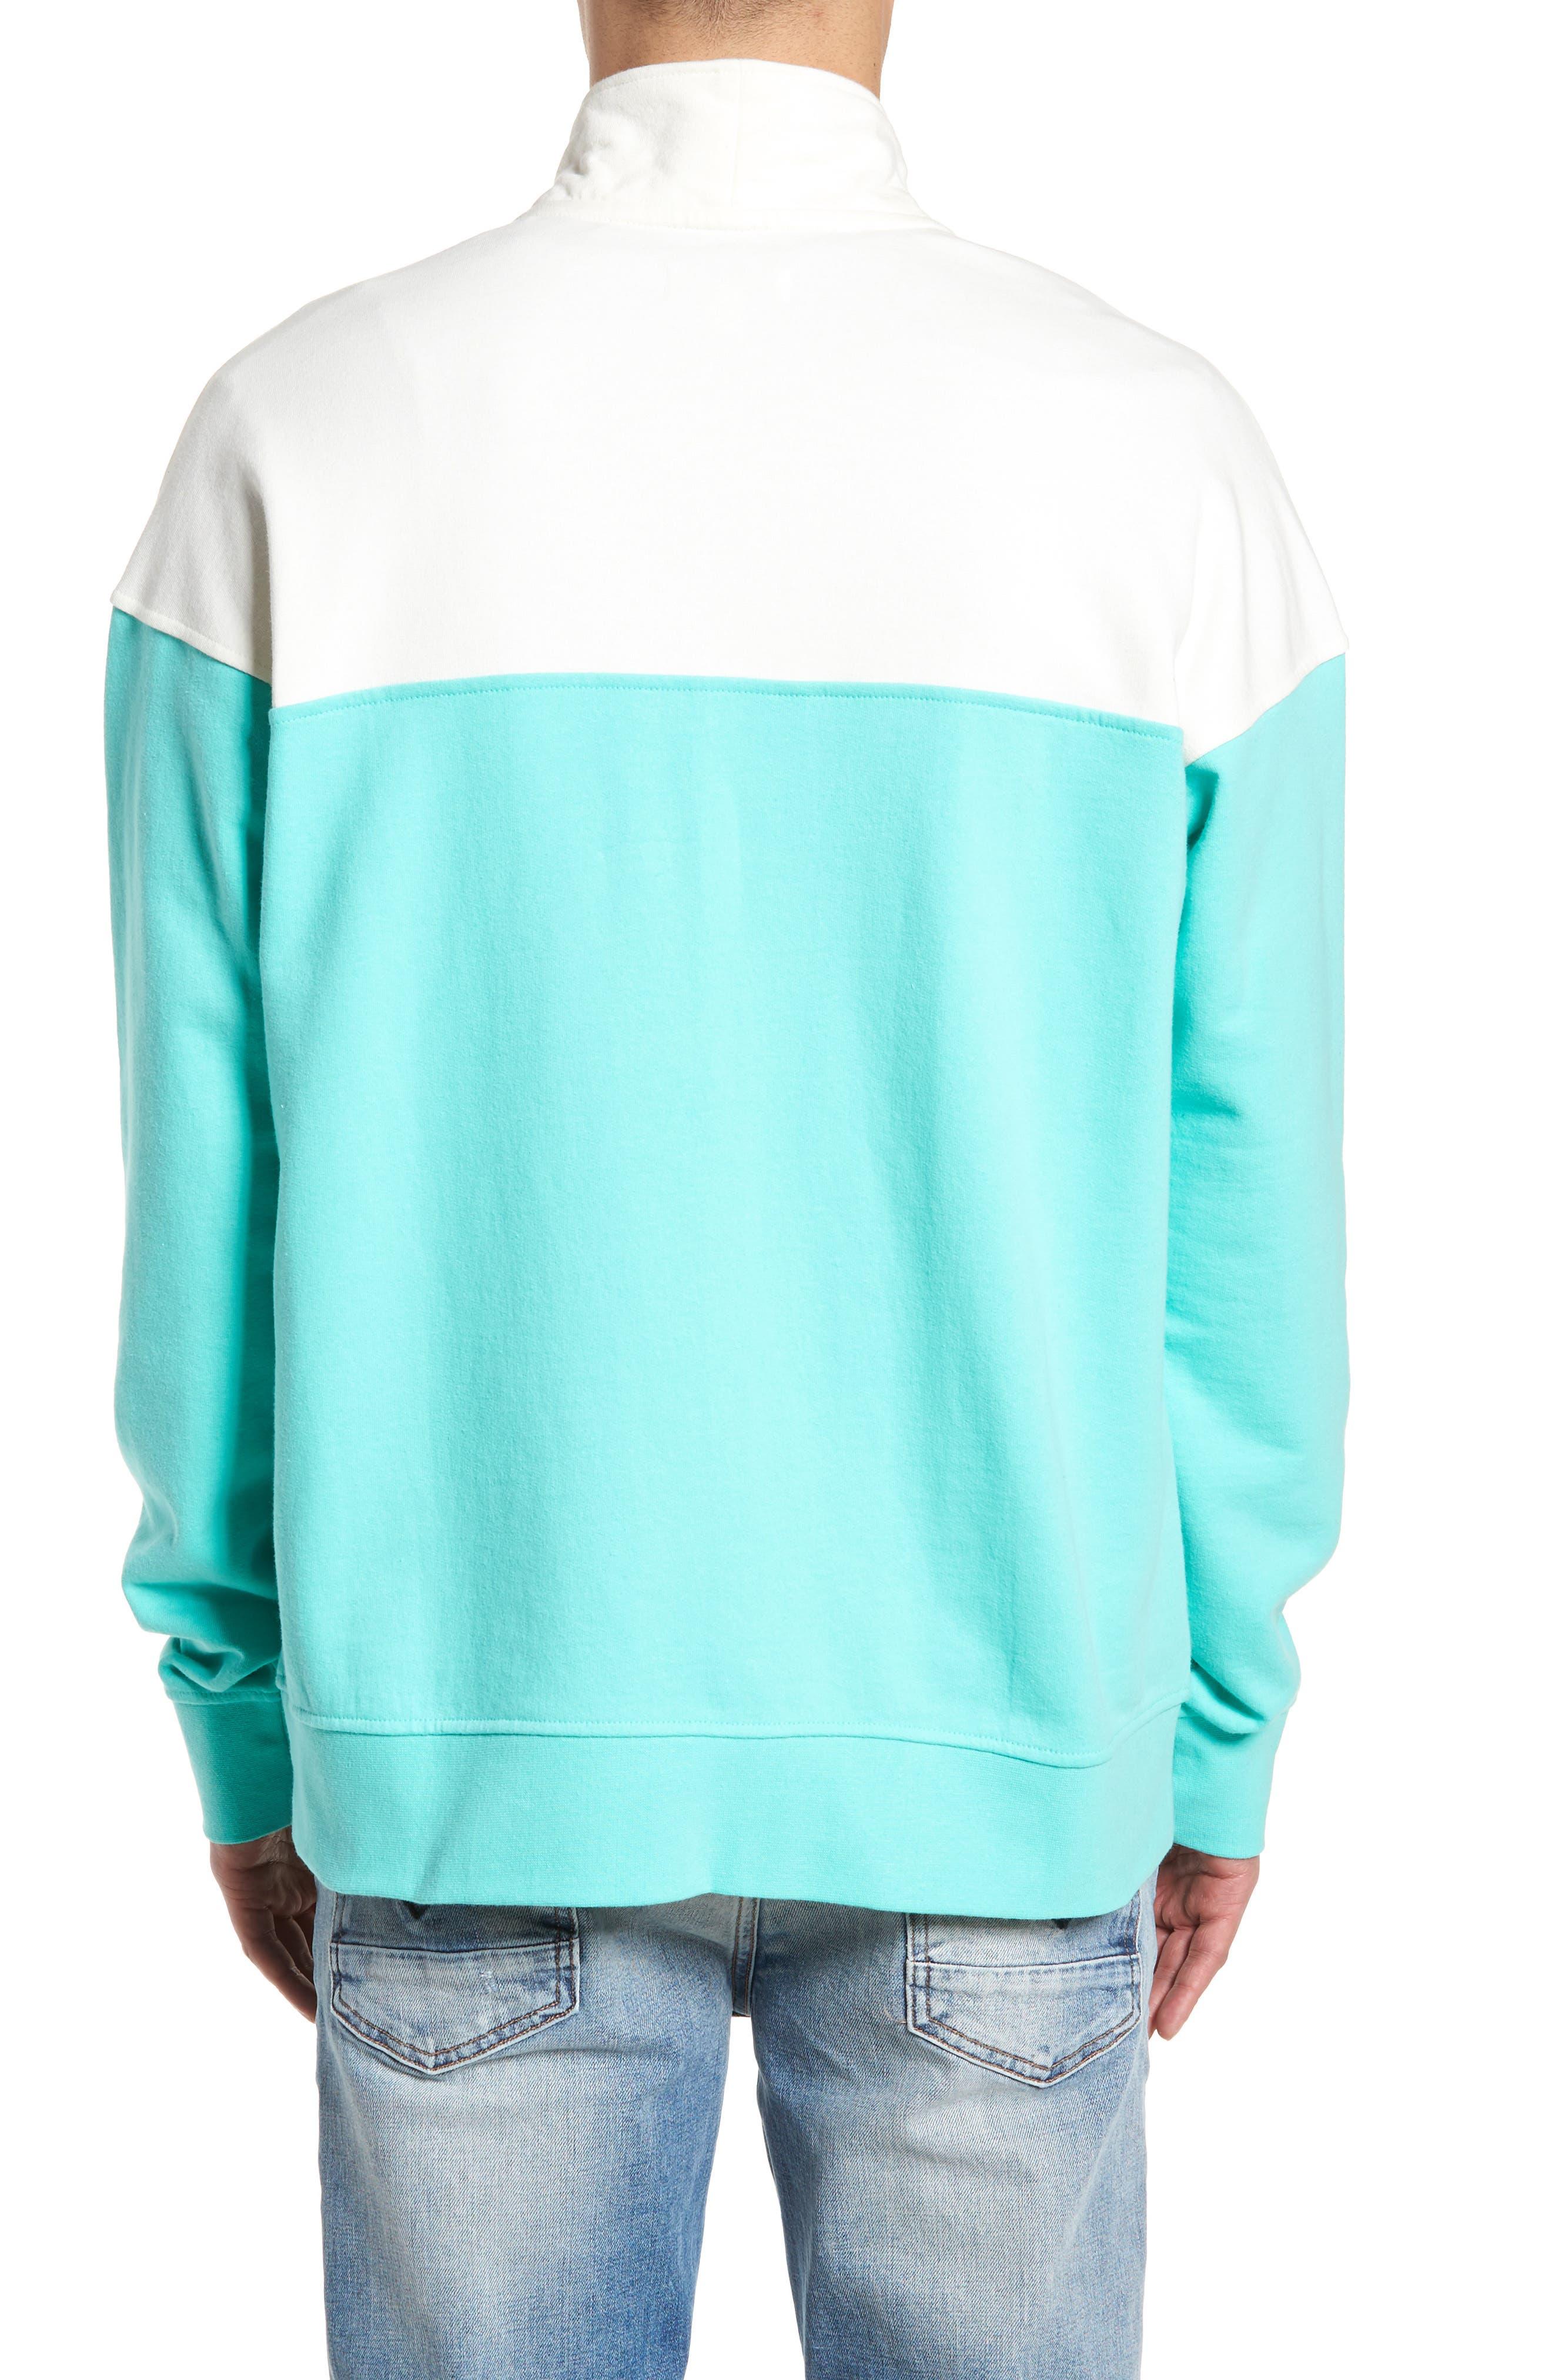 Colorblock Quarter Zip Sweatshirt,                             Alternate thumbnail 2, color,                             900